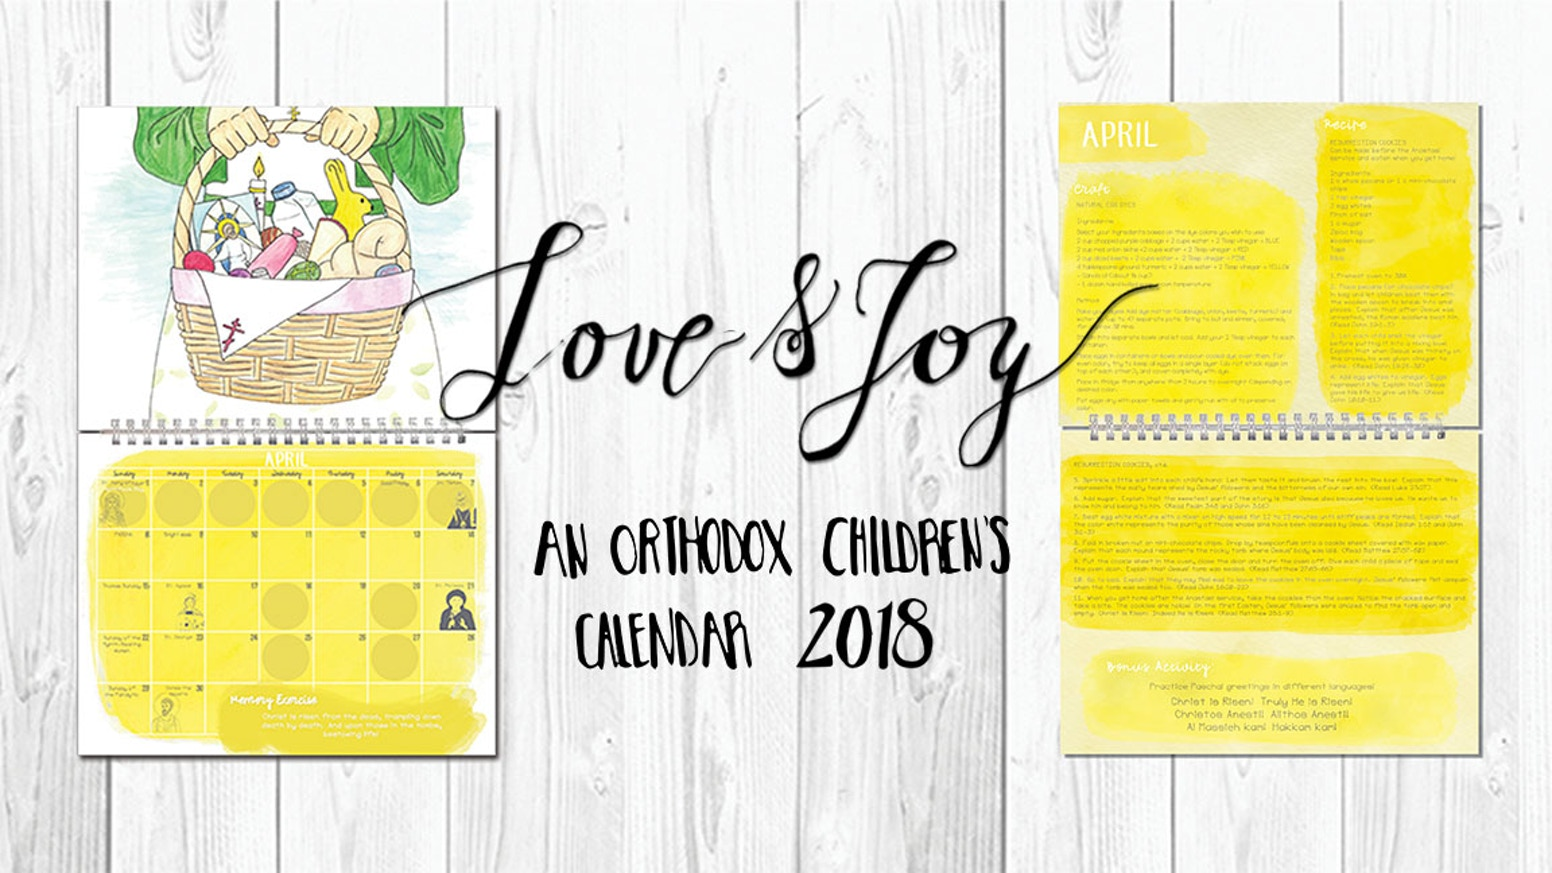 Love & Joy: An Orthodox Children\'s Calendar 2018 by Marian, Abigail ...